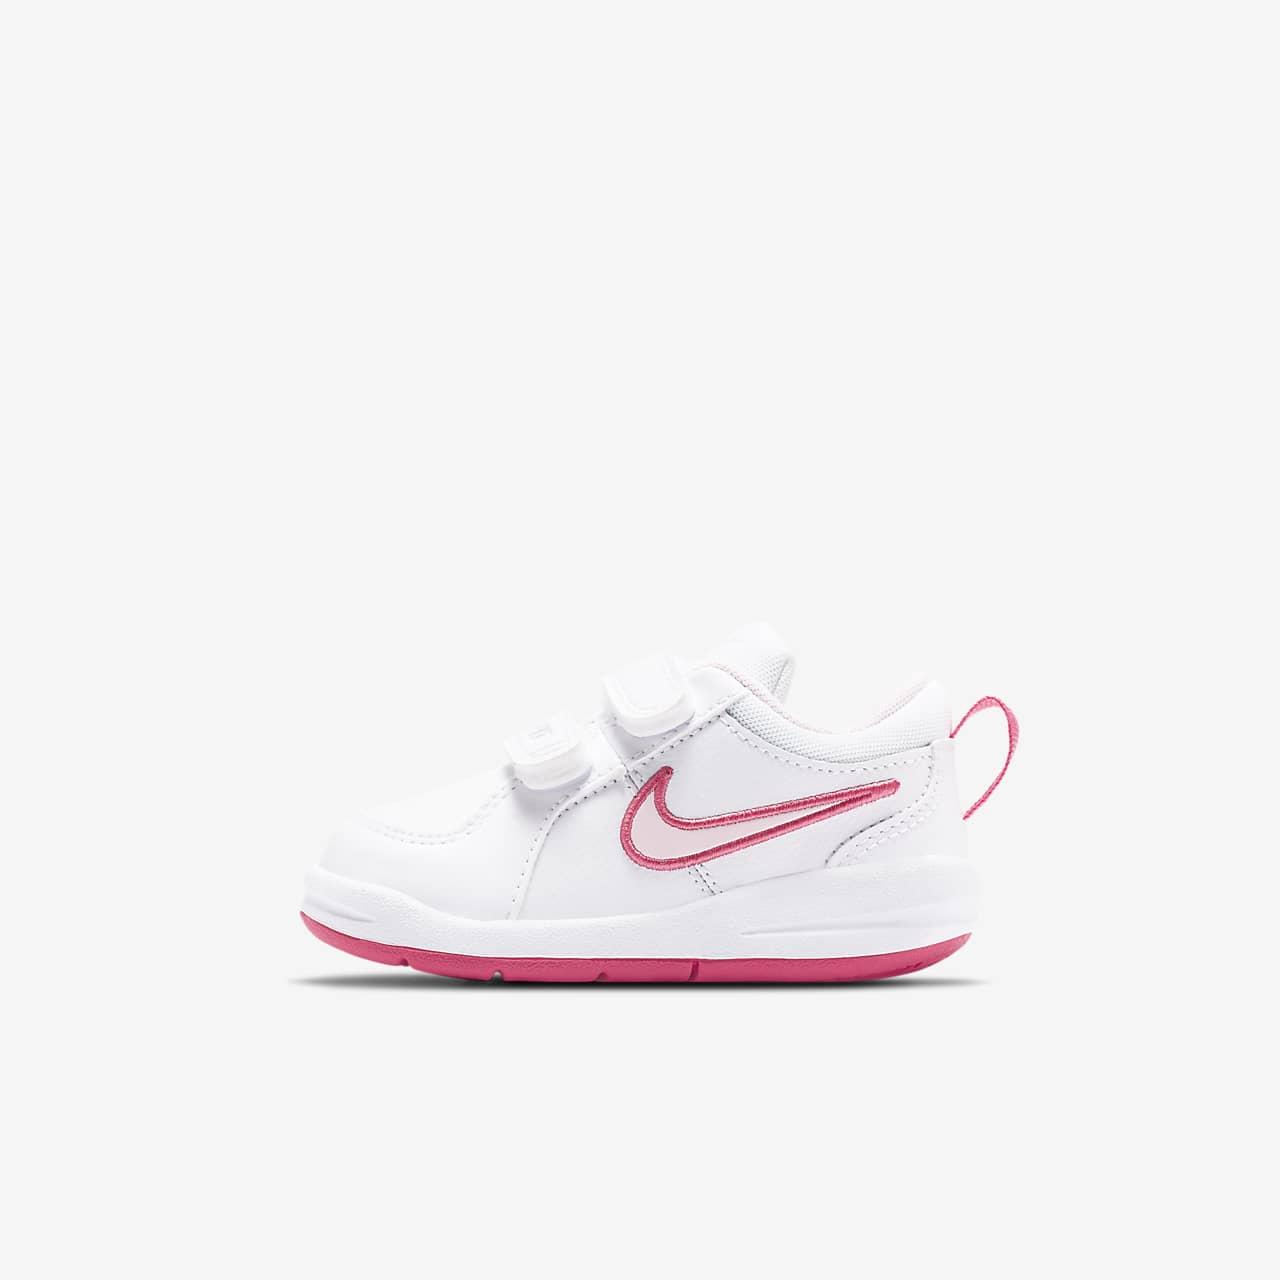 Nike Pico 4 (2c-10c) 嬰幼兒女童鞋款